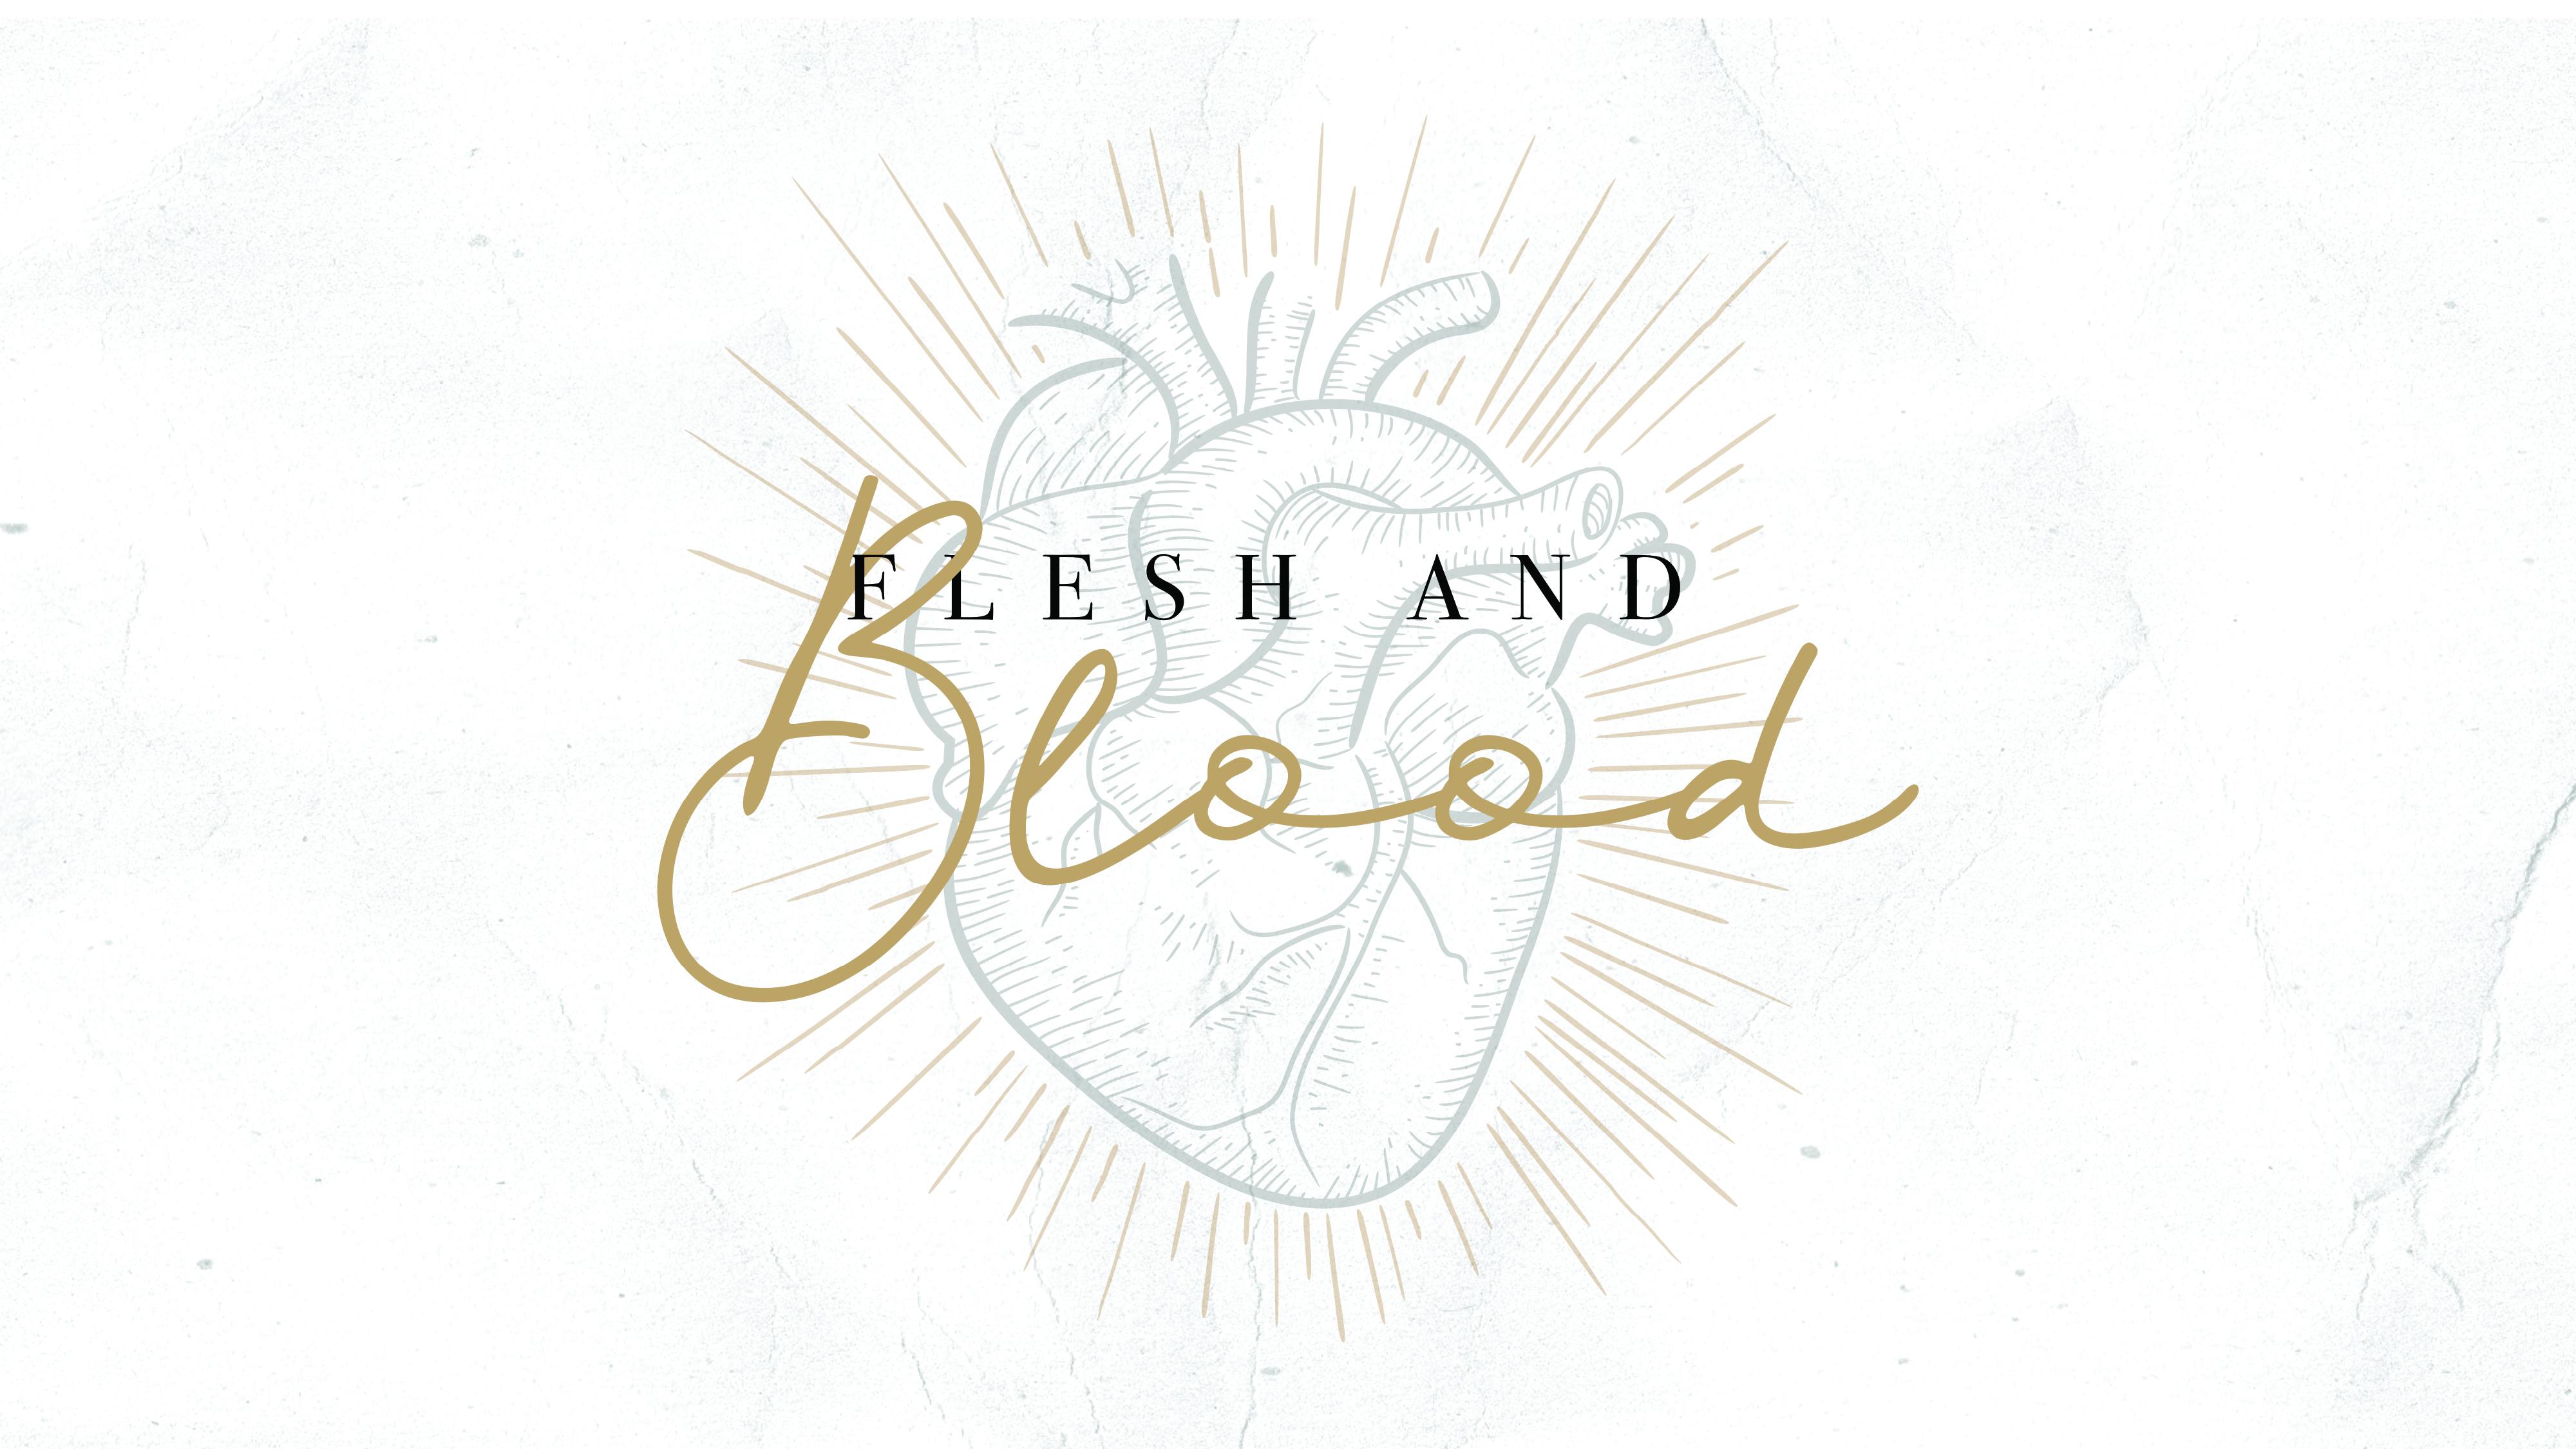 Flesh and Blood Image